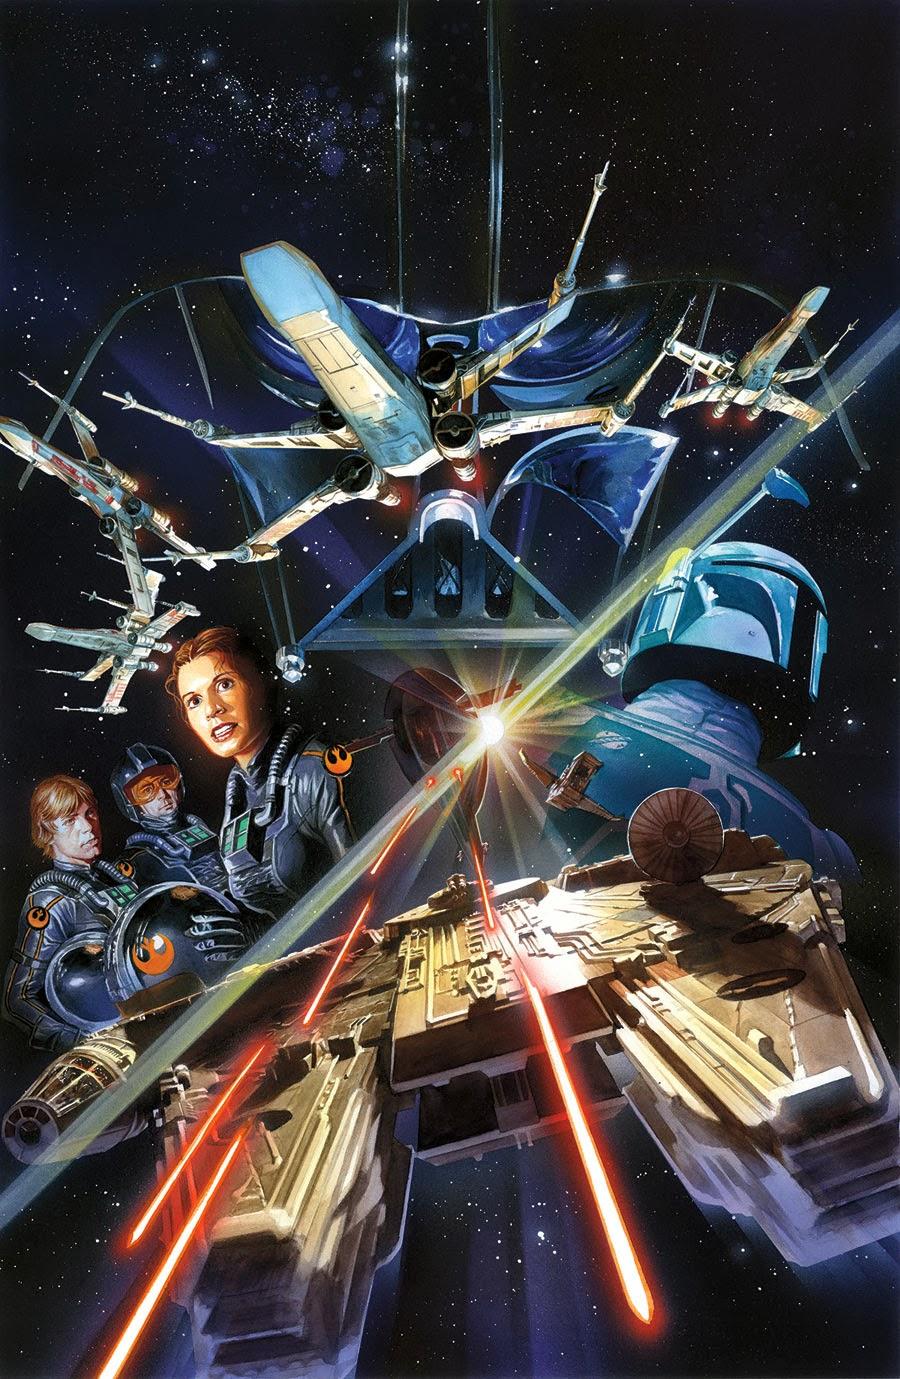 Coleccionista de Imagenes Alex Ross Portadas de Star Wars